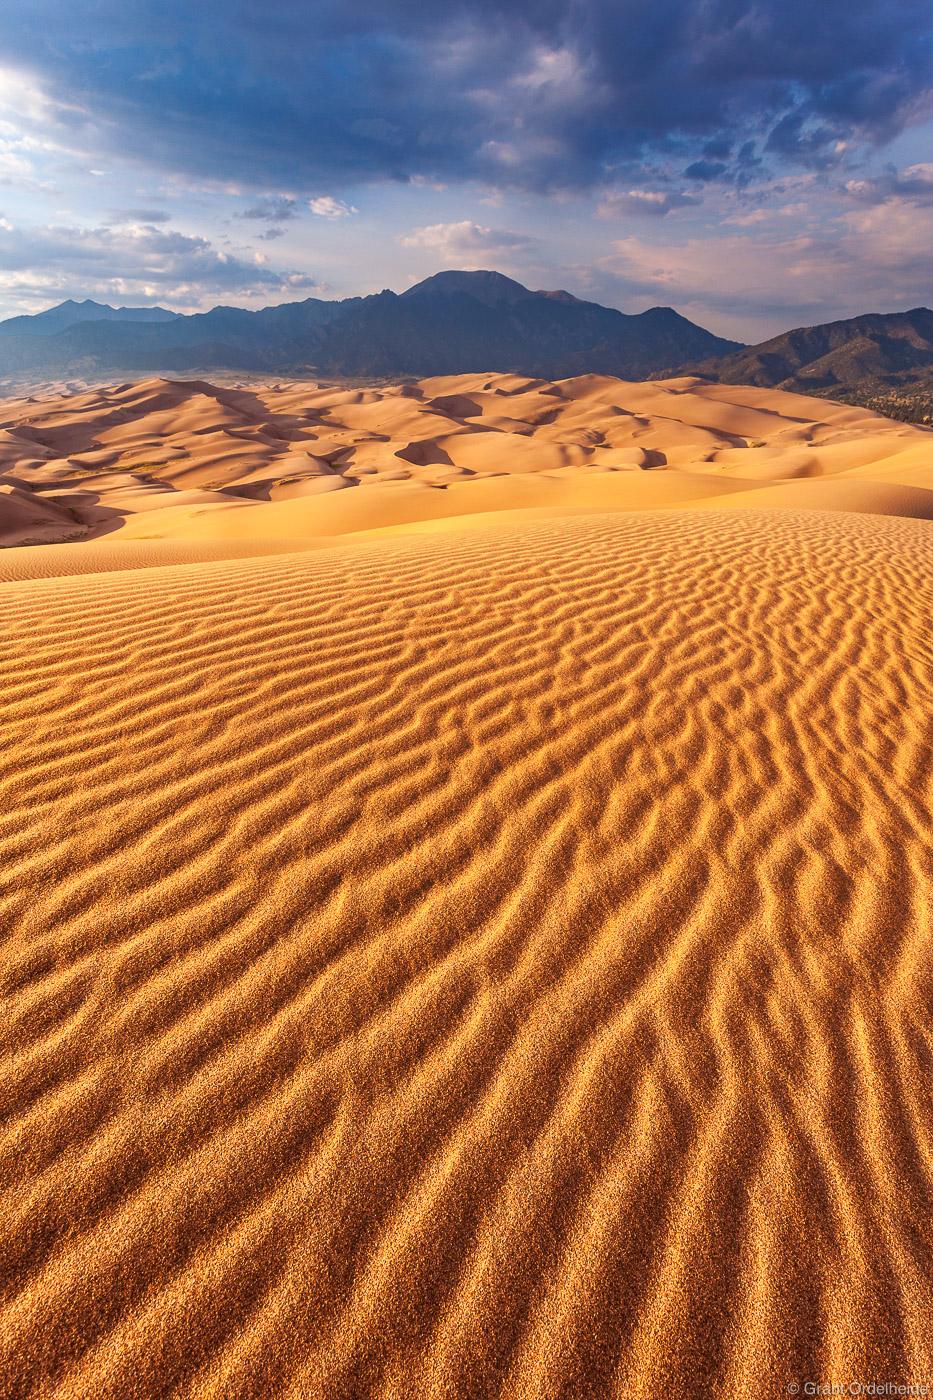 dune, ripples, great, sand, dunes, national, park, colorado, mt herard, sangre de cristos, mountains, photo